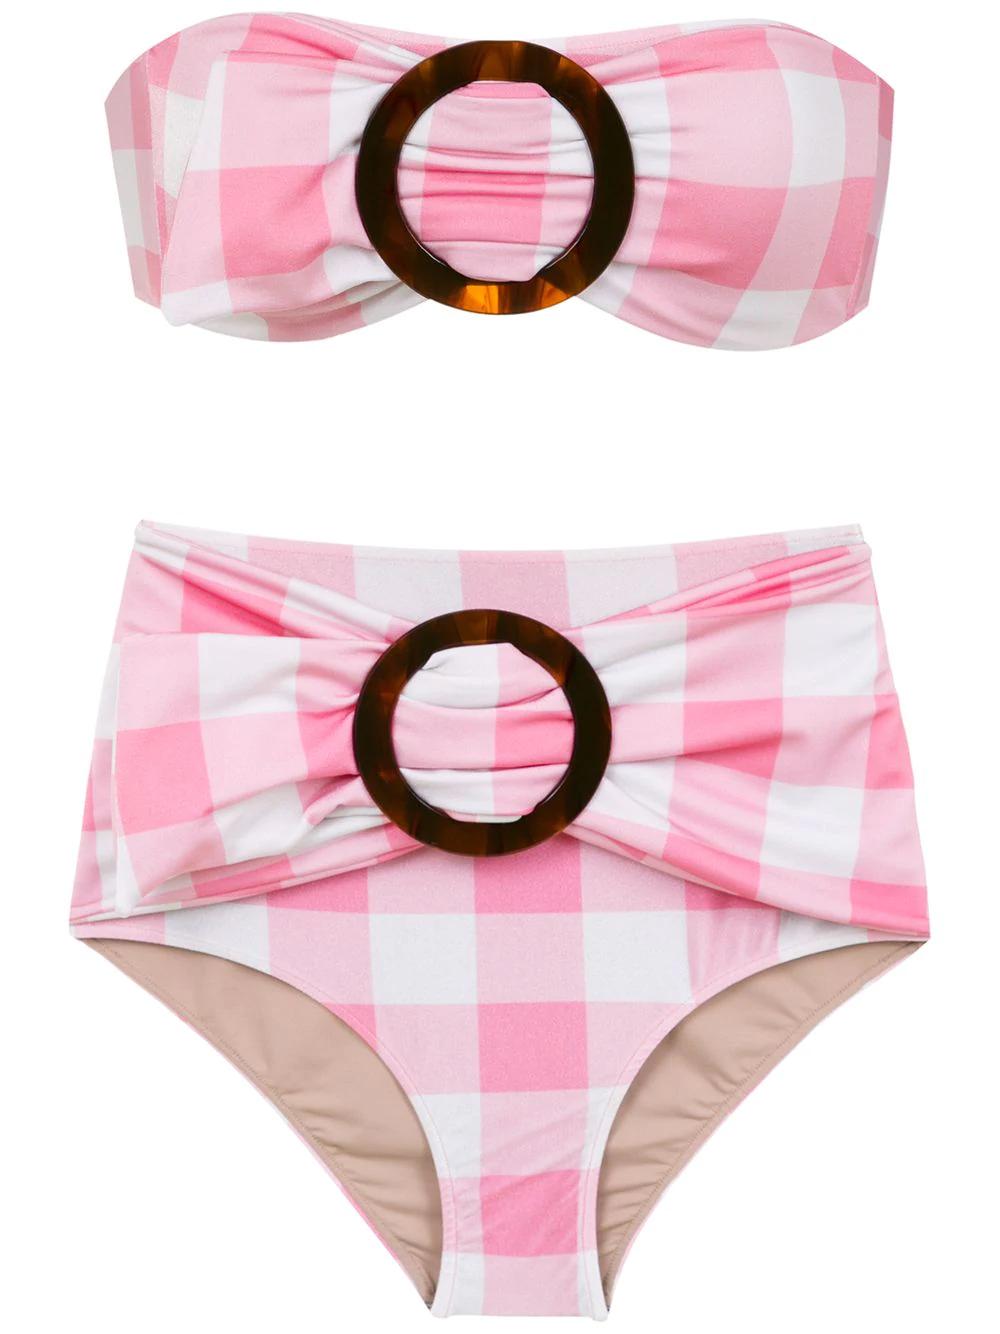 bfd986f60e83e Adriana Degreas Plaid Bikini Set - Pink